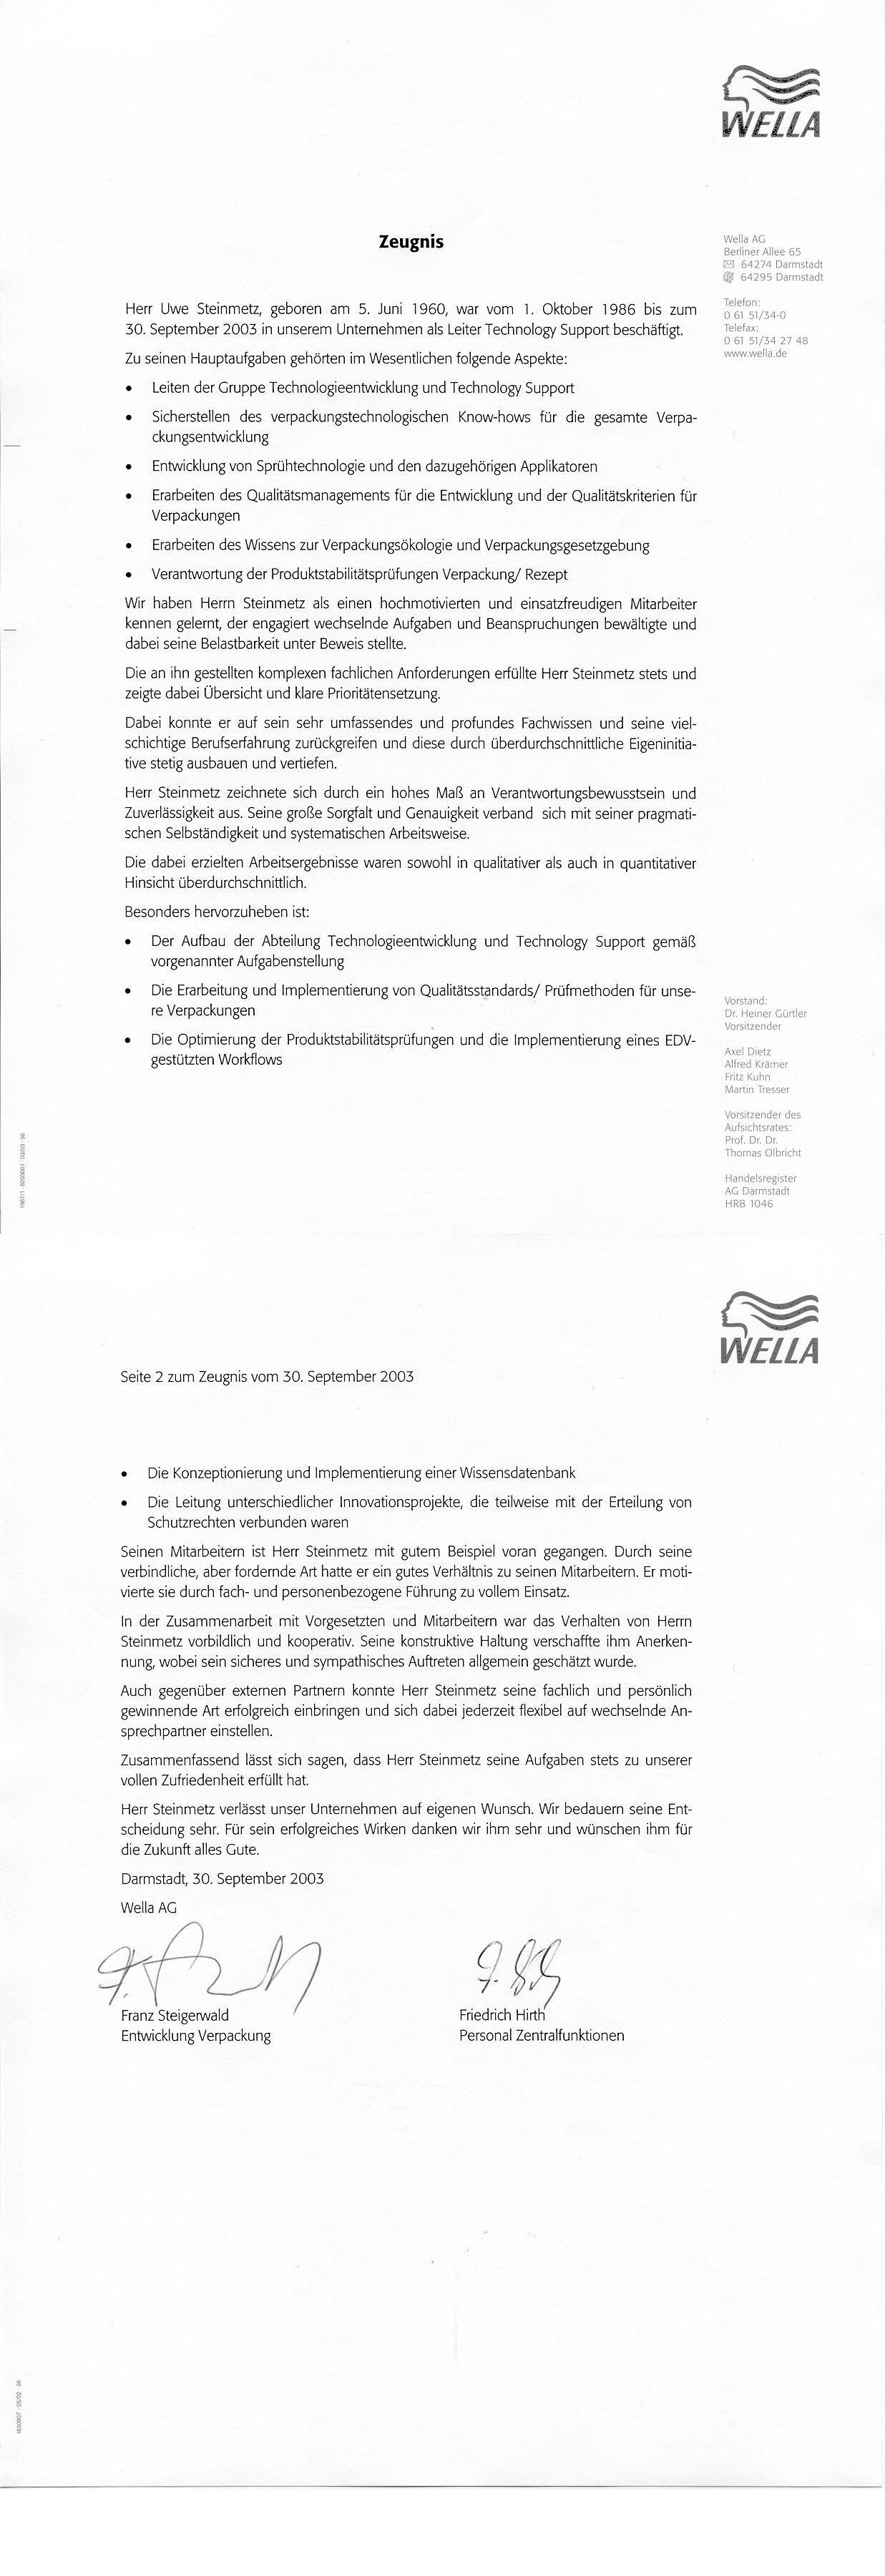 Wella AG Darmstadt Kosmetik Verpackungen